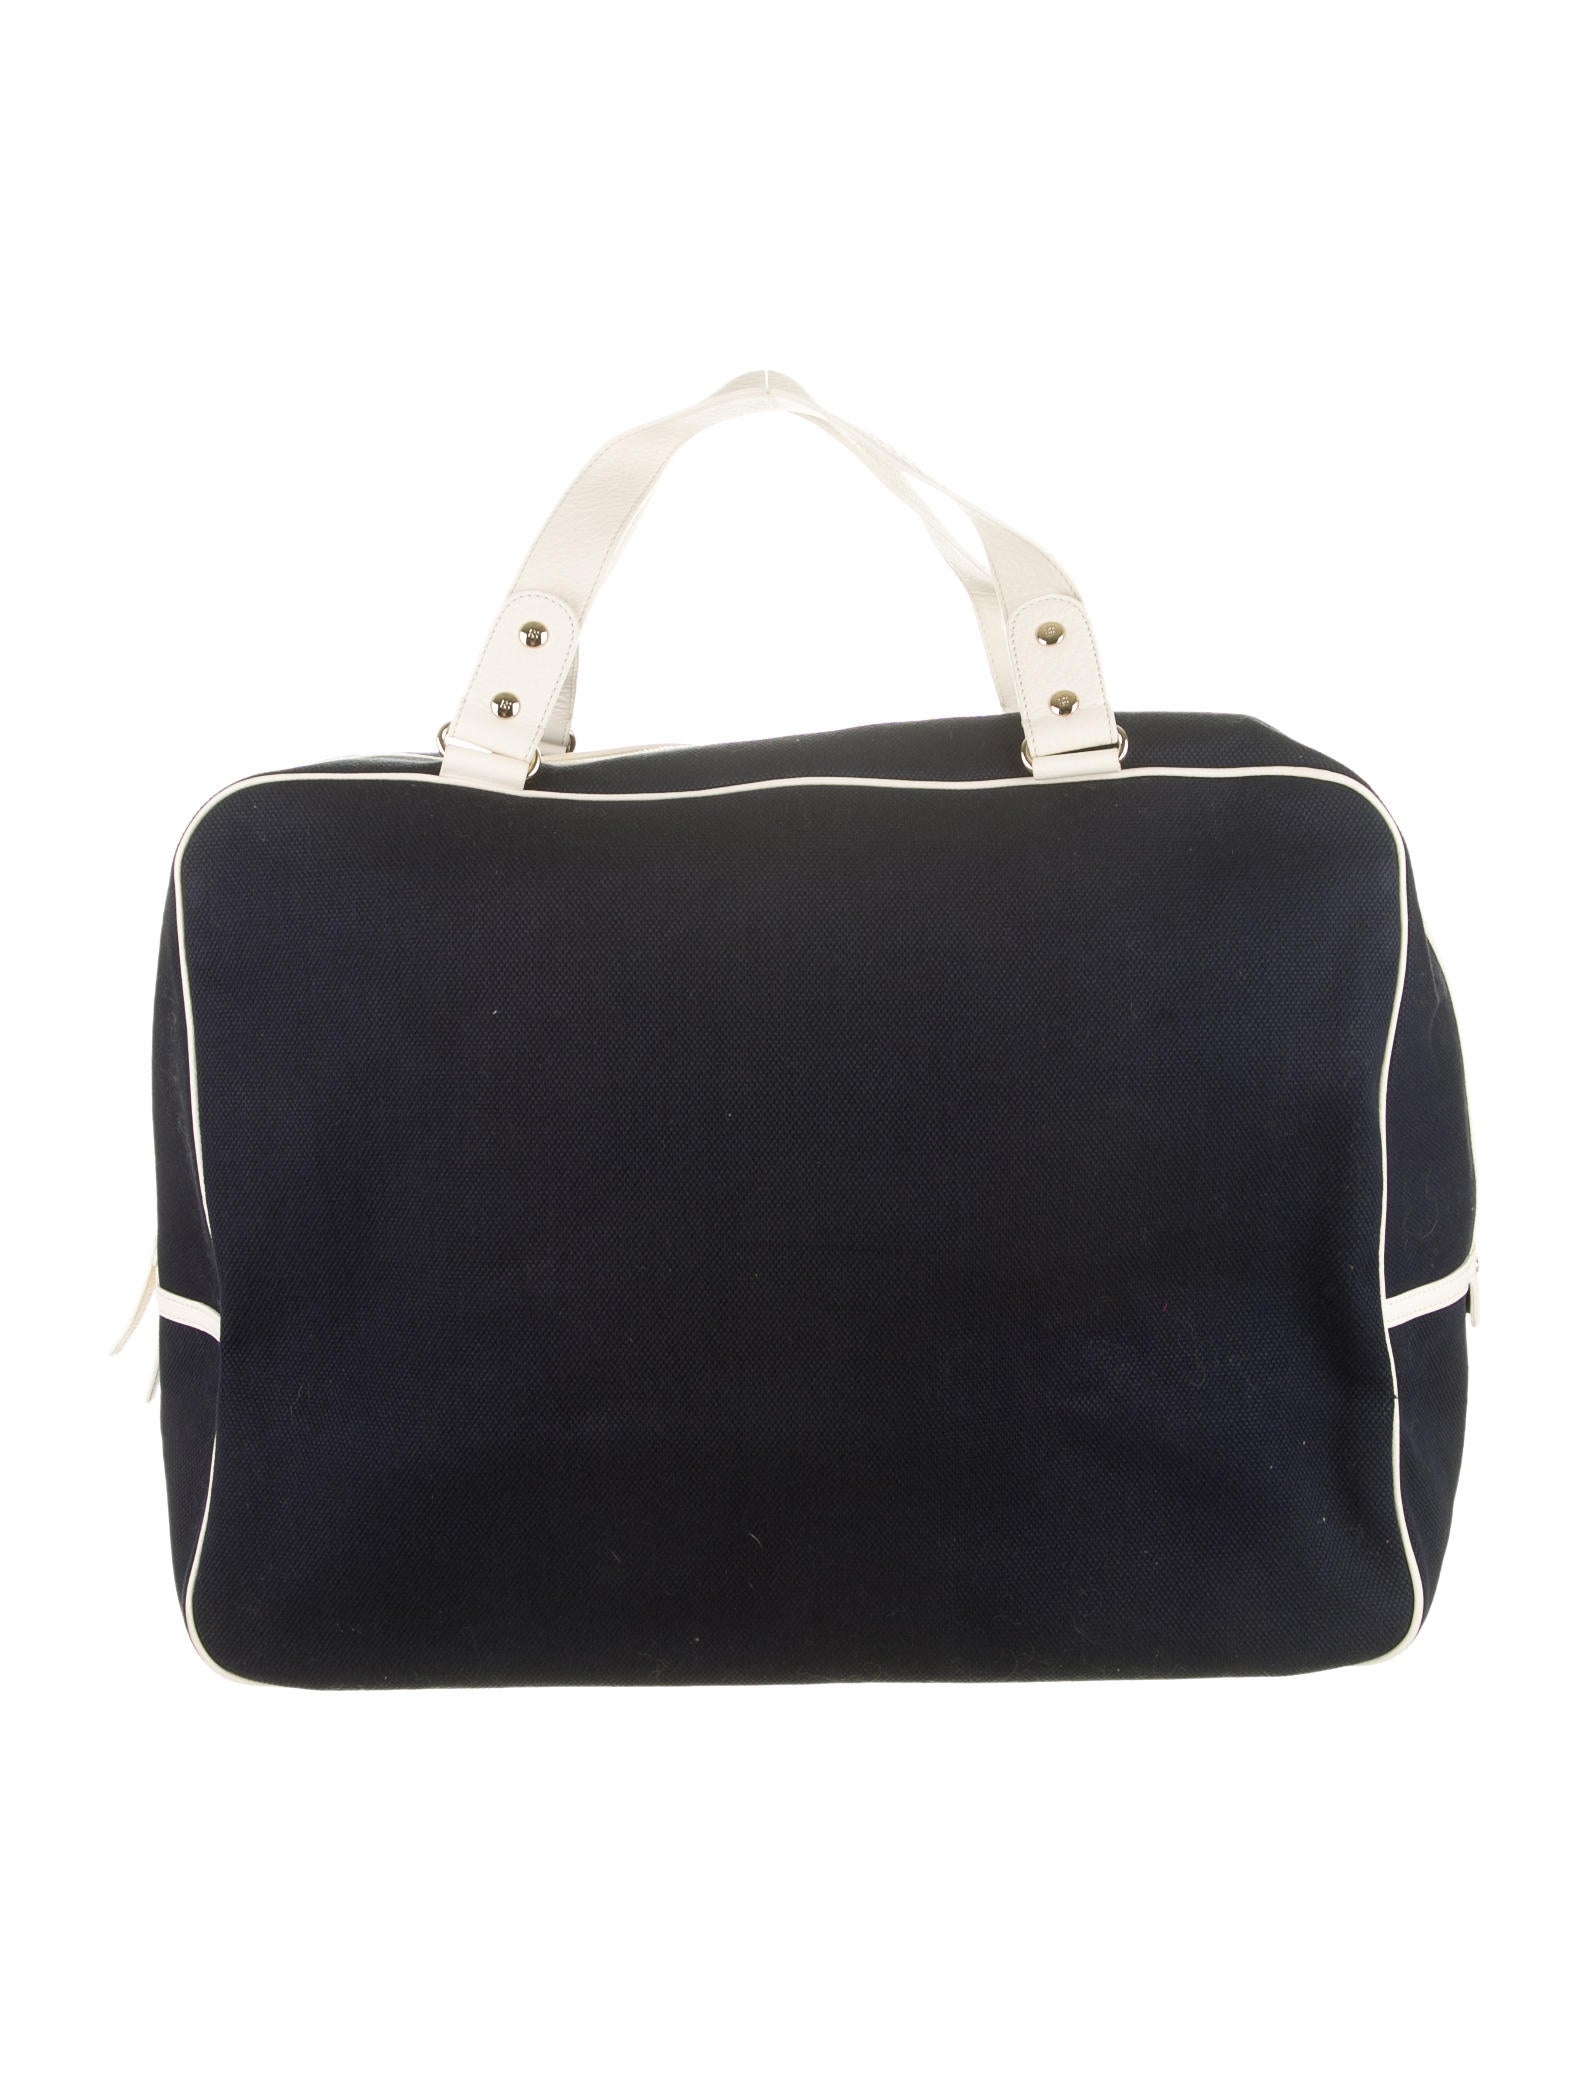 53706c9bc Kate Spade Outlet Riverhead Chanel Handbags Saks Fifth Avenue | Bus ...